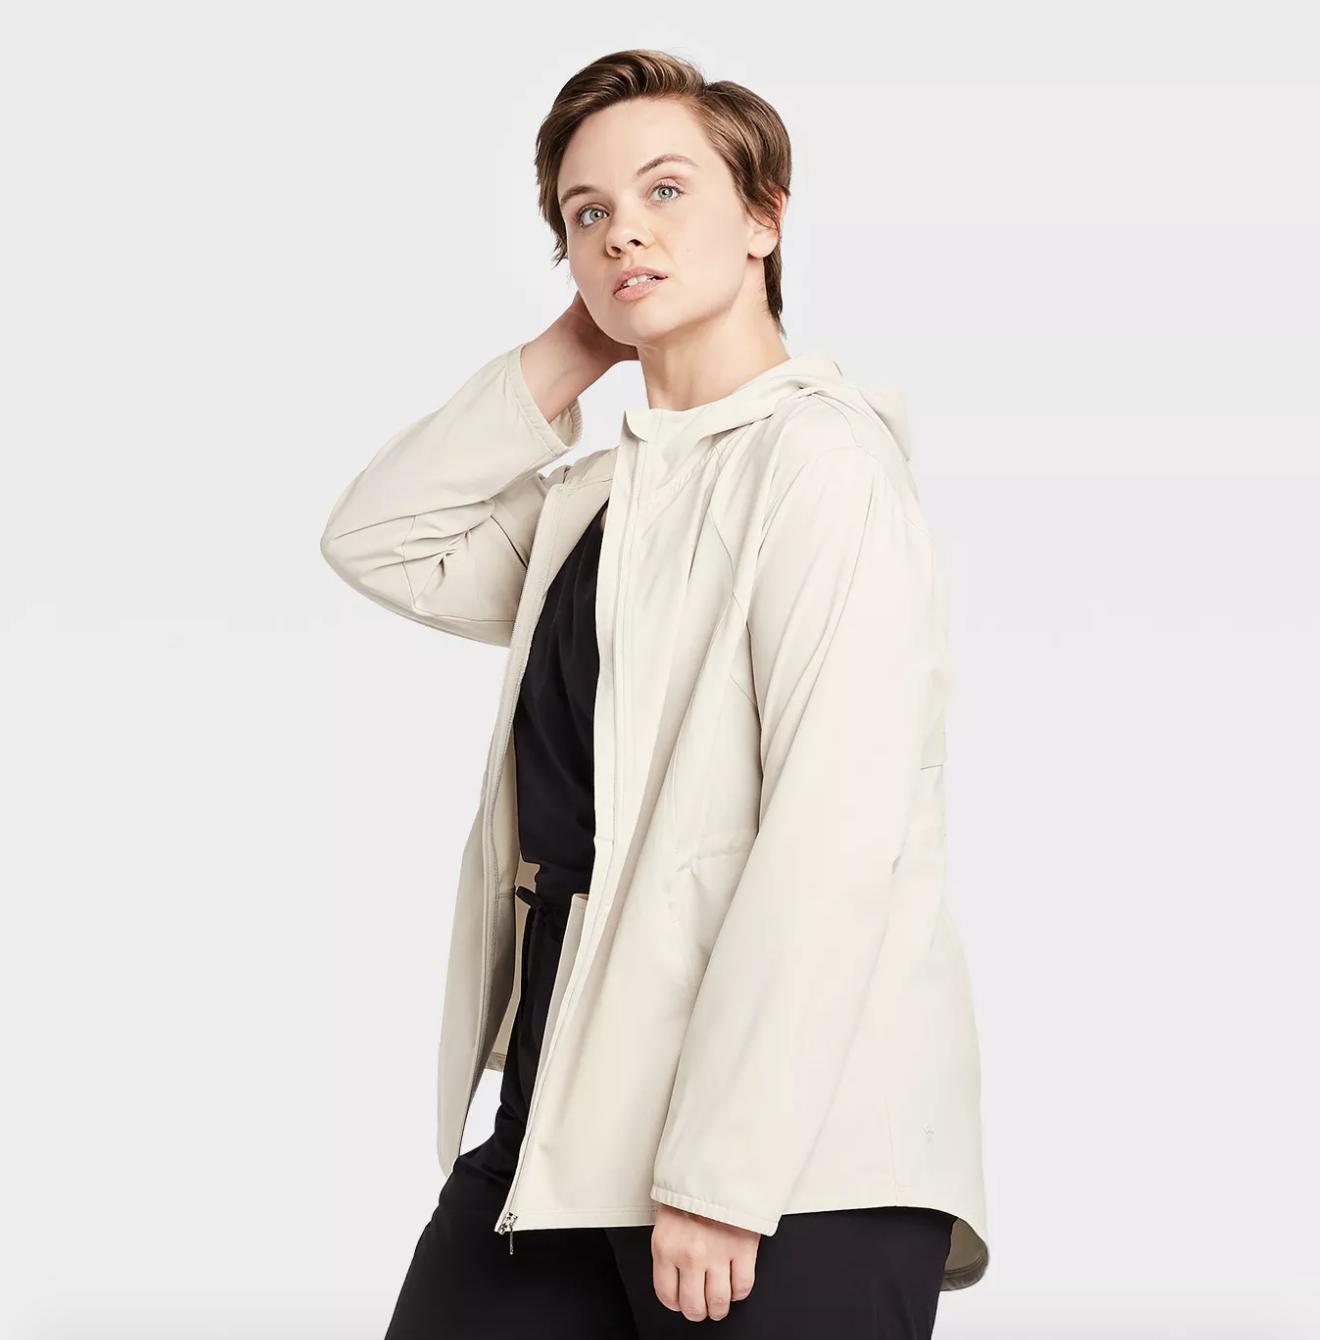 model in lightweight white rain jacket